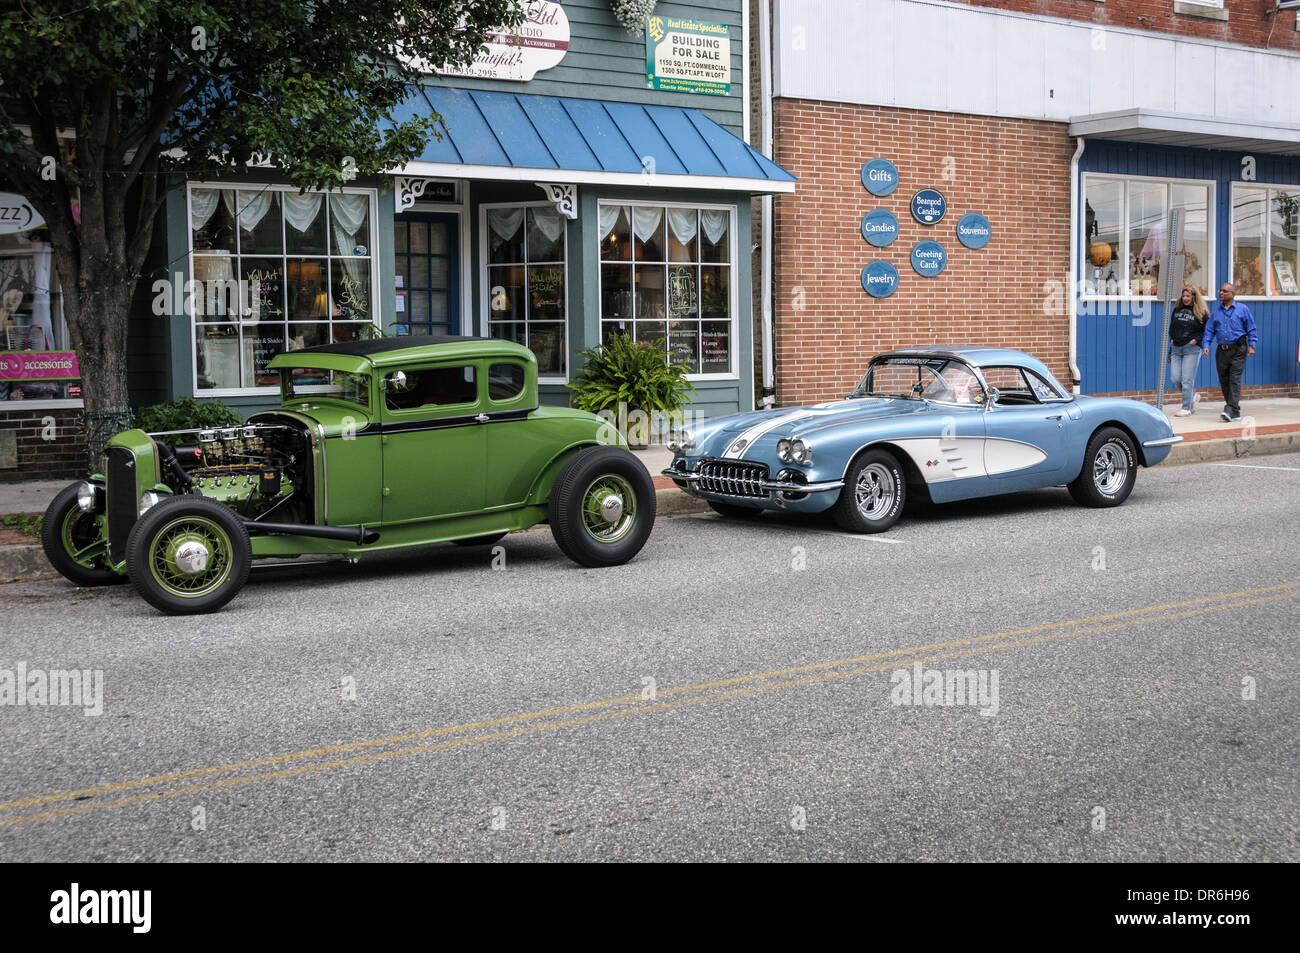 1930 Model A Ford Hot Rod and 1959 Corvette, Havre de Grace ...